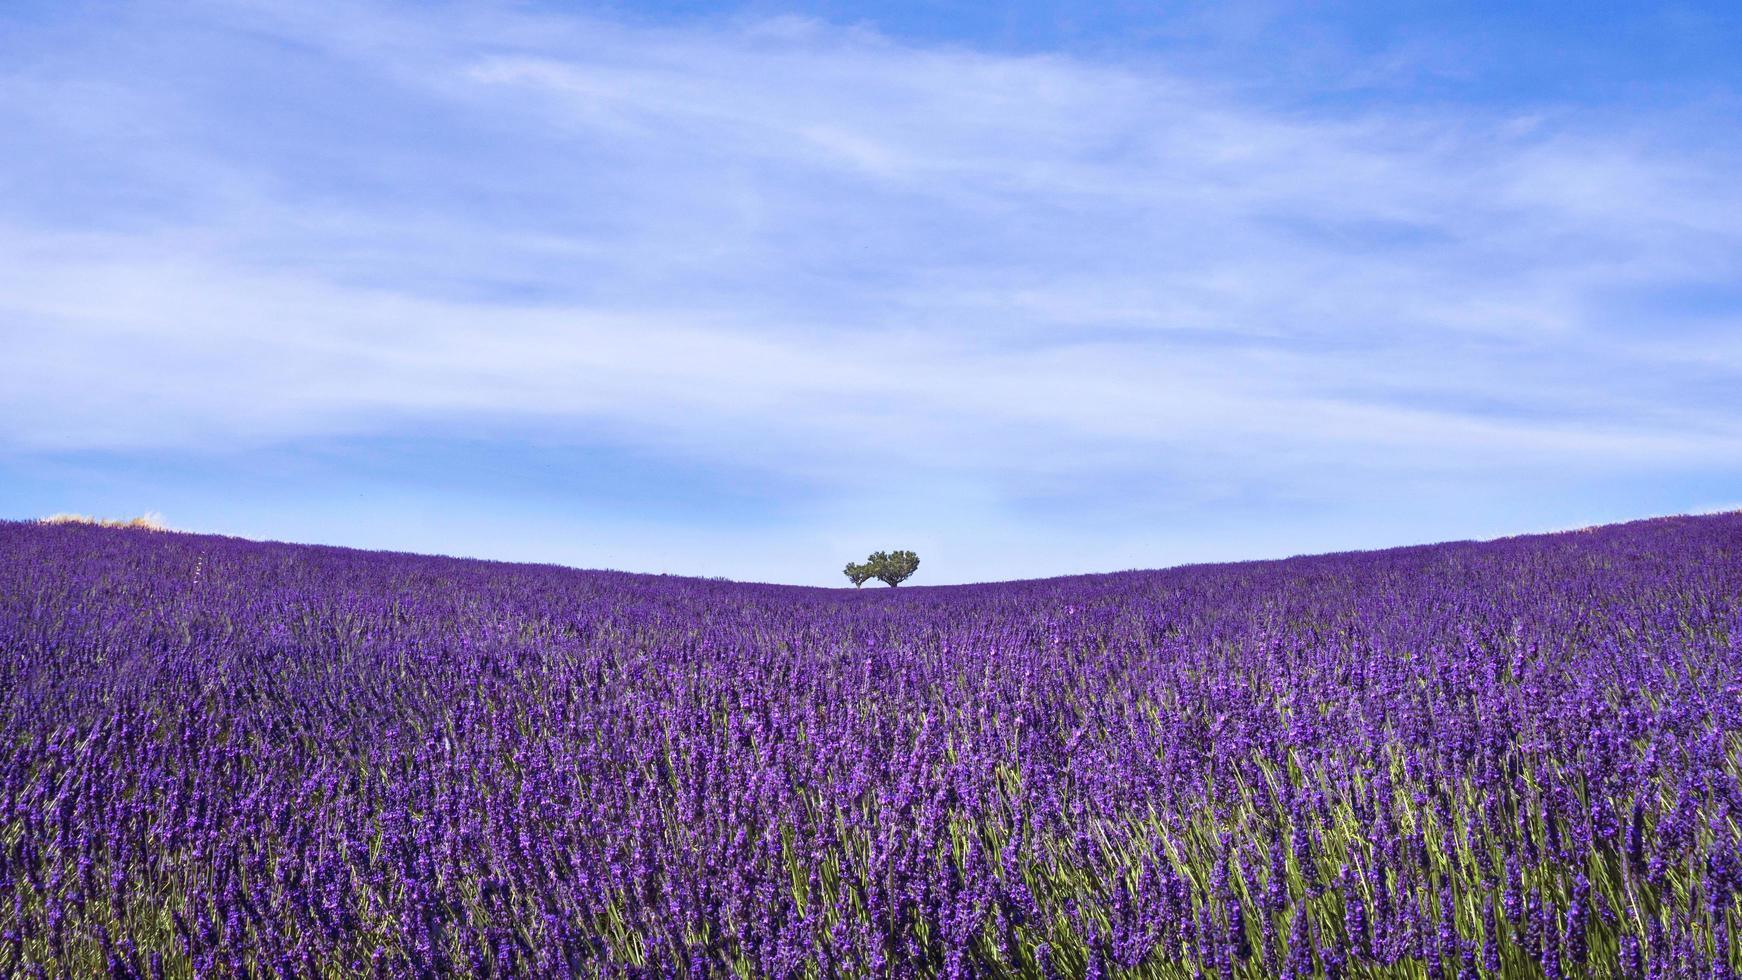 minimalistisk landskapsvy av lavendelfält i provence, france foto